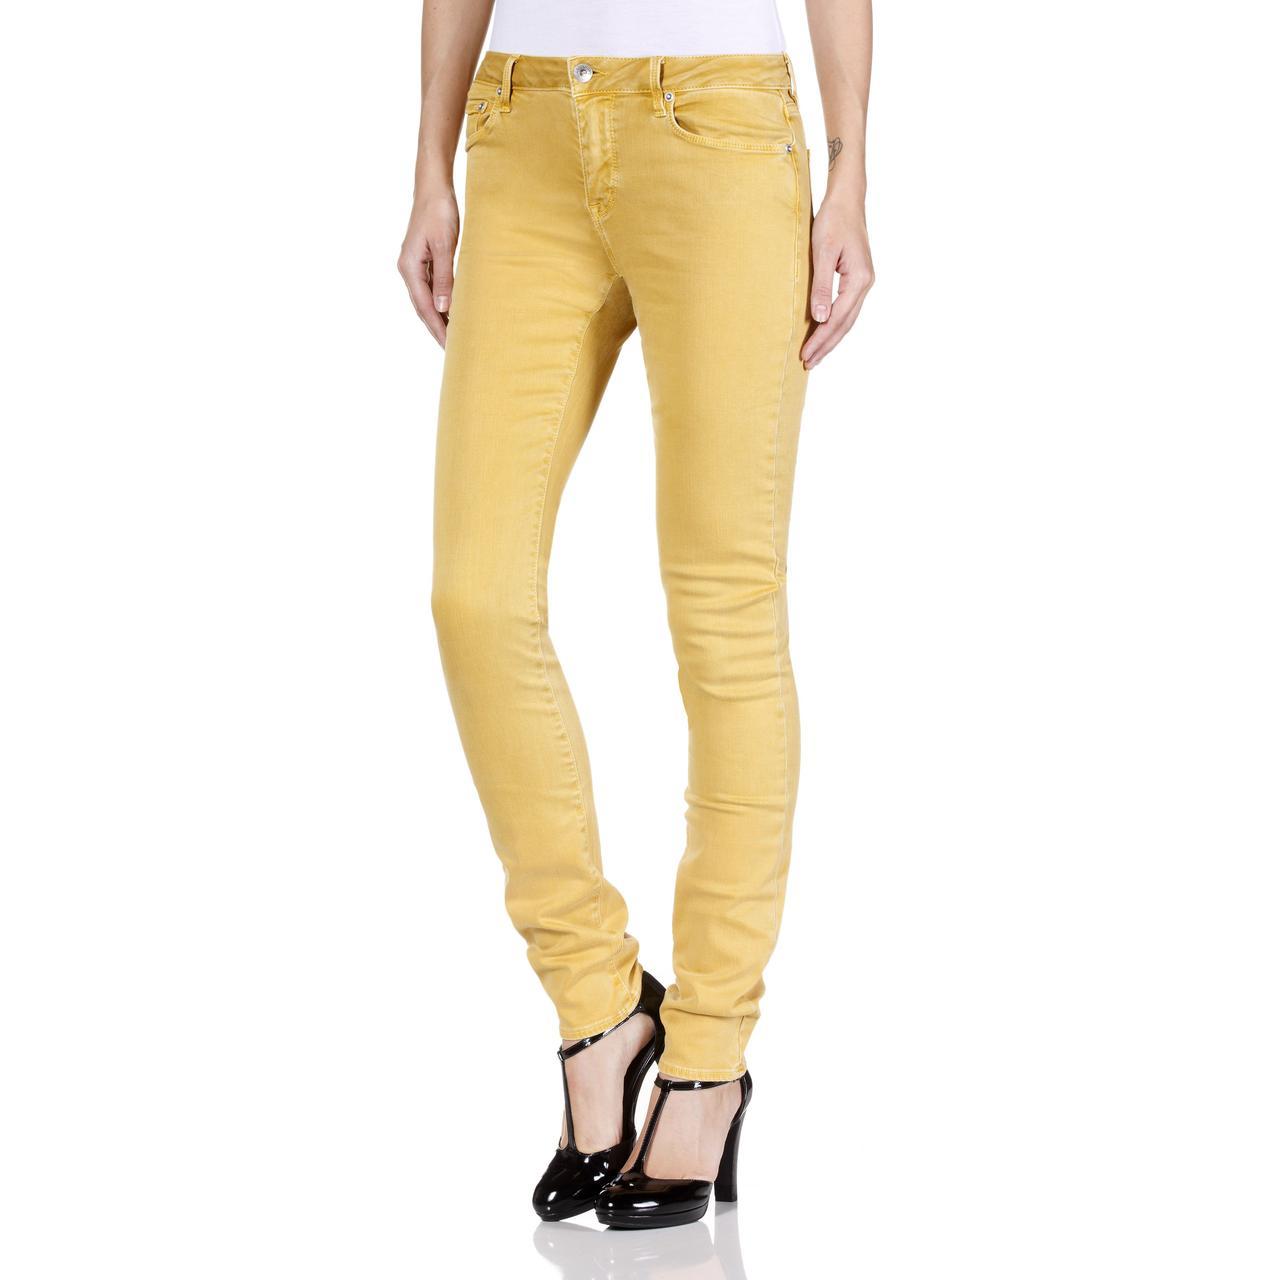 Женские модные джинсы Geox W3432G OCHRE